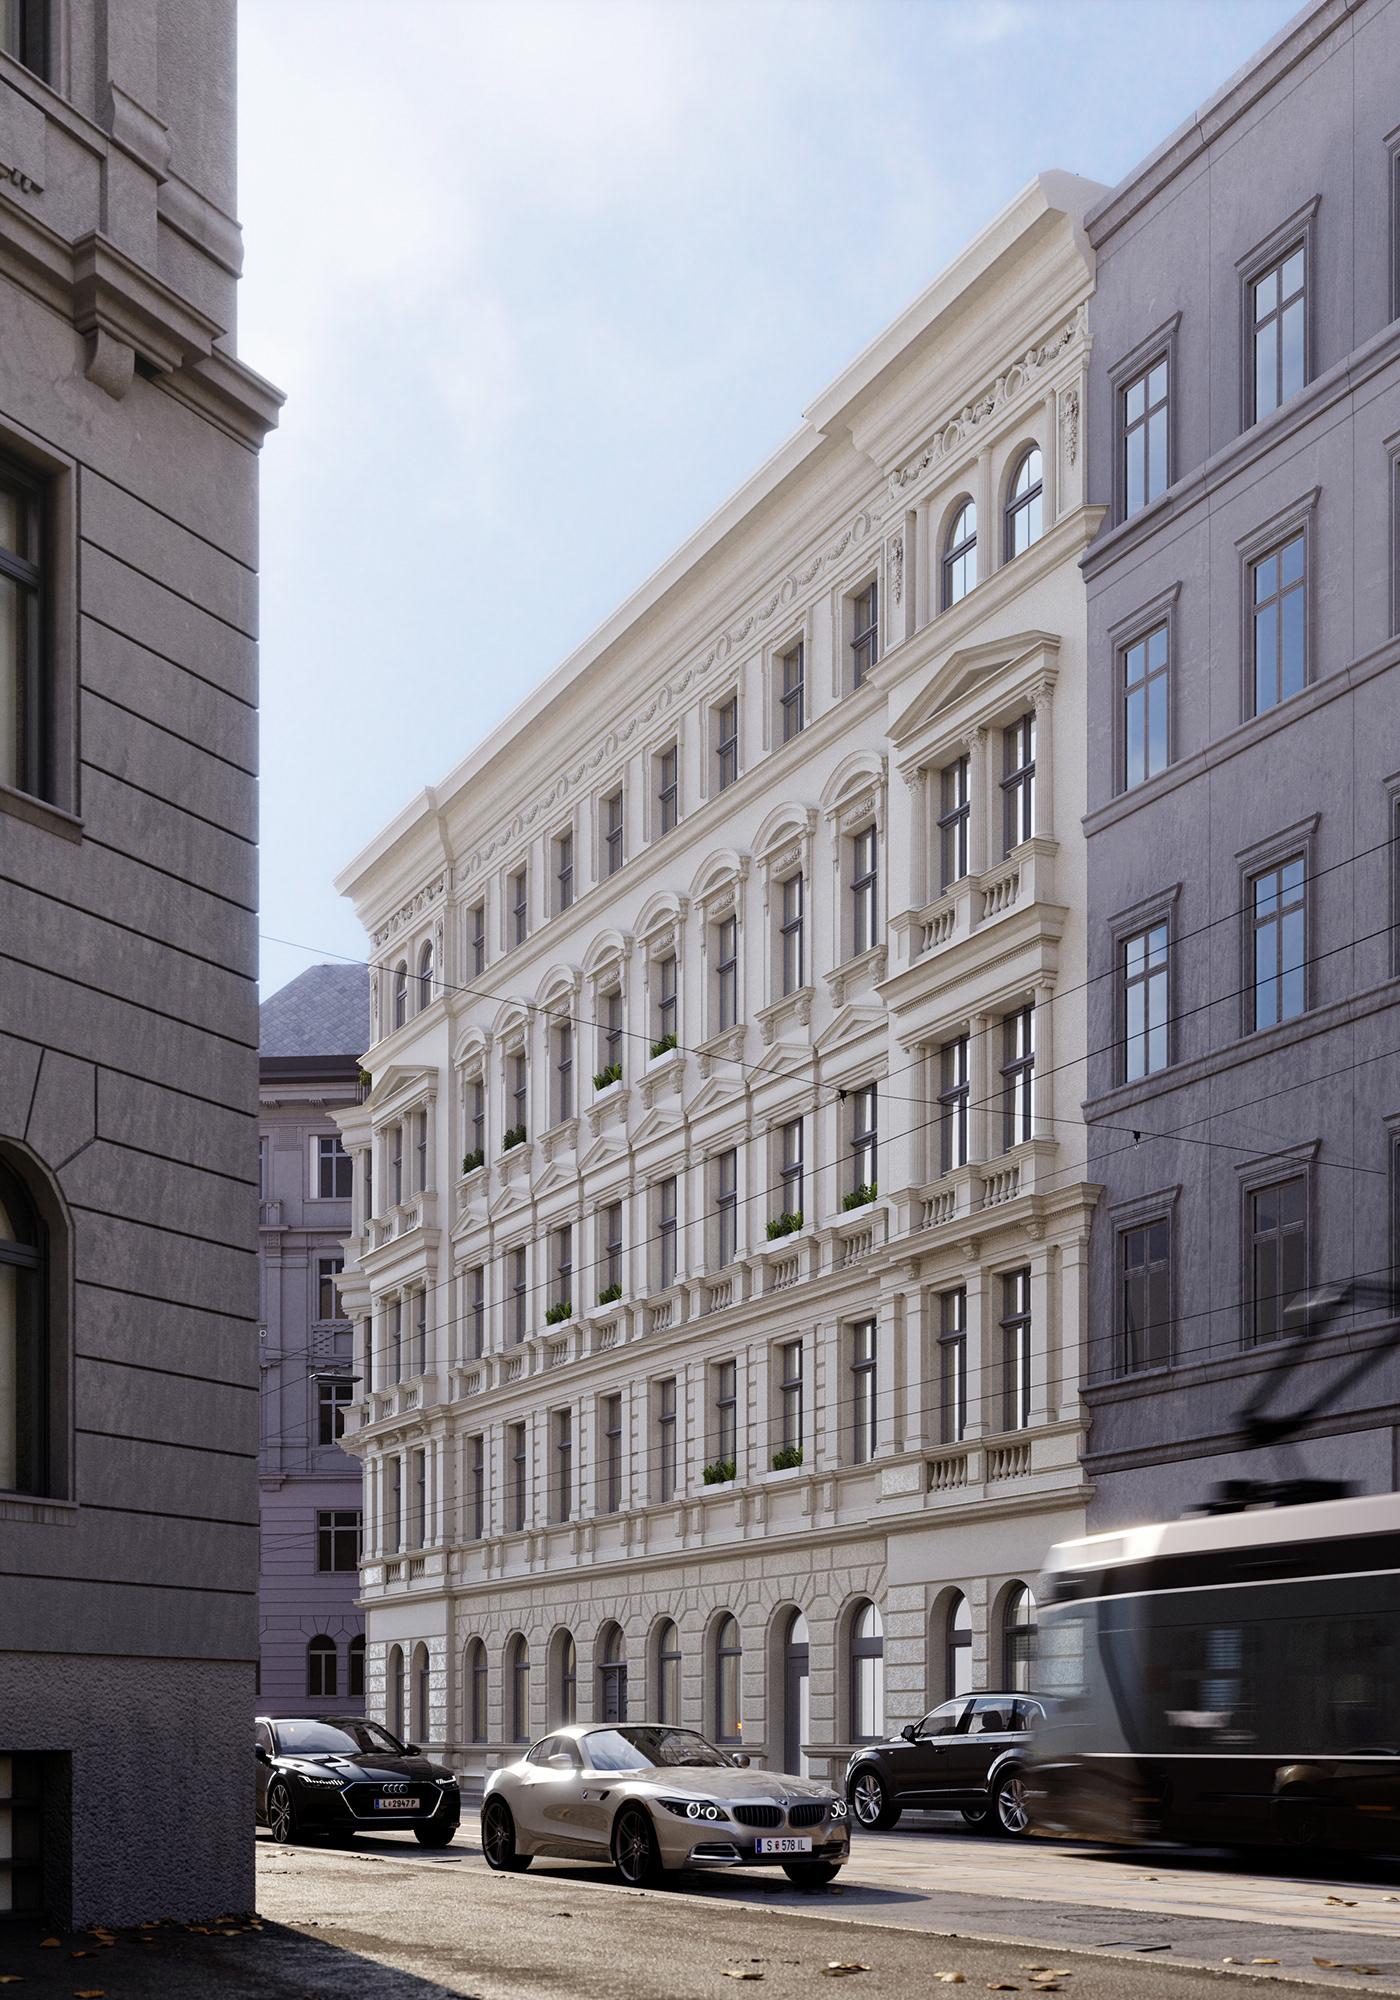 architecture archviz blender building city cycles e-cycles exterior Street vienna